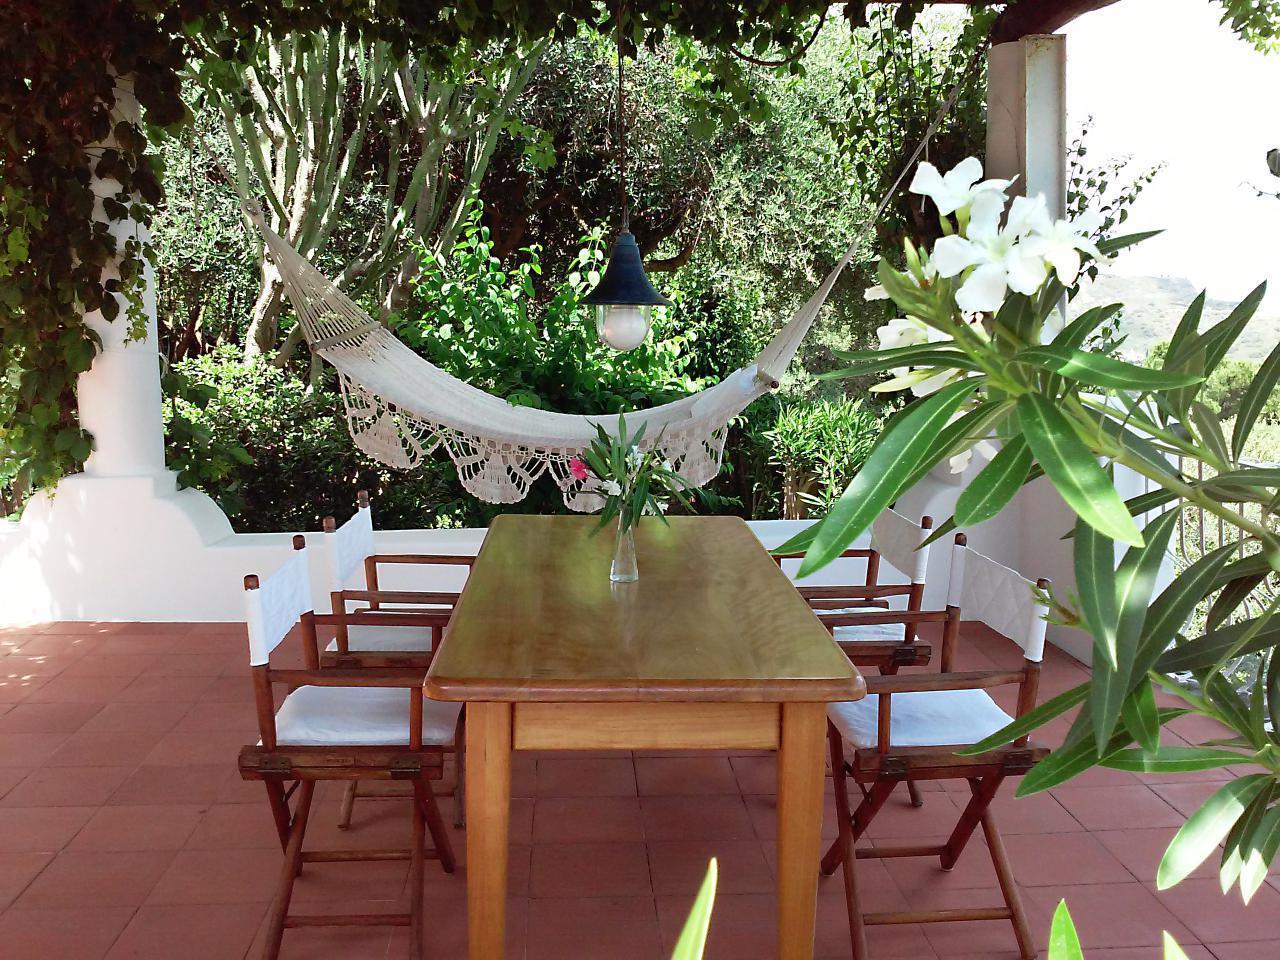 Maison de vacances Ferienhaushälfte Solandra auf sizilianischer Insel mit atemberaubenden Meeres-Rundblick (2038046), Lipari, Lipari, Sicile, Italie, image 3